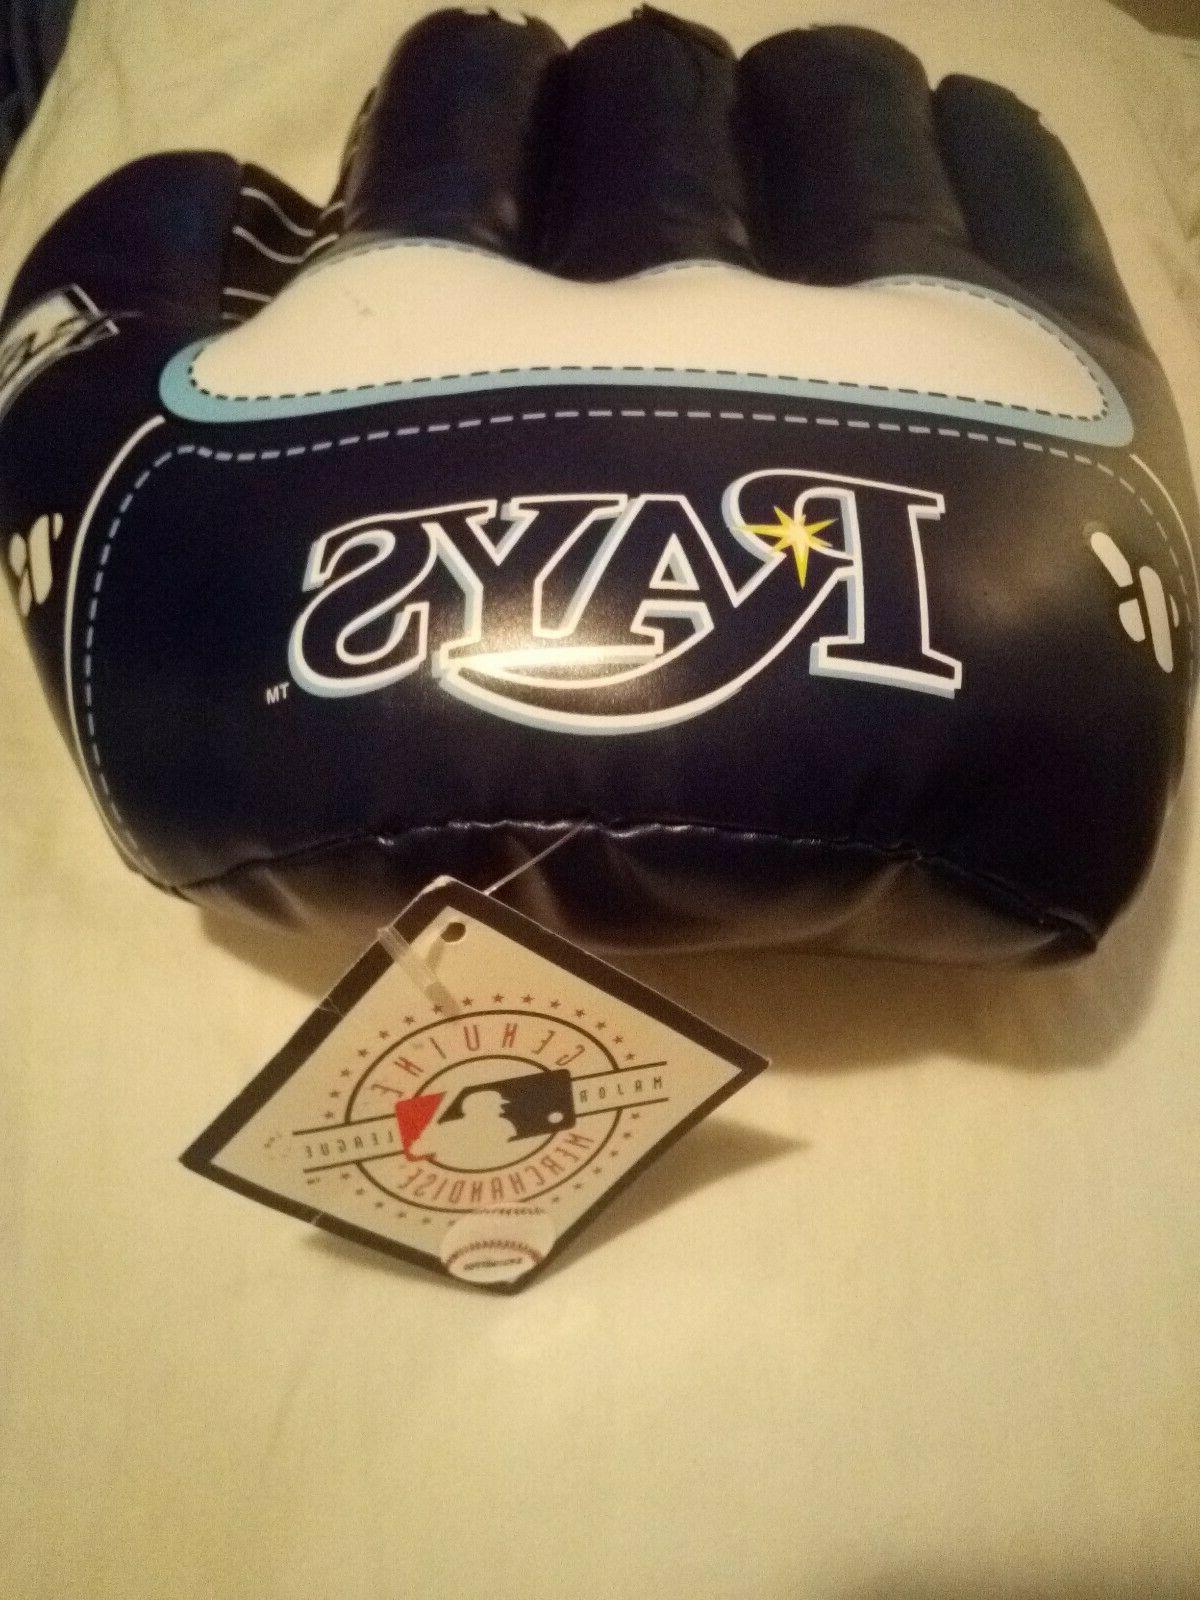 Tampa Rays Major Fan Waver Toy Cushion